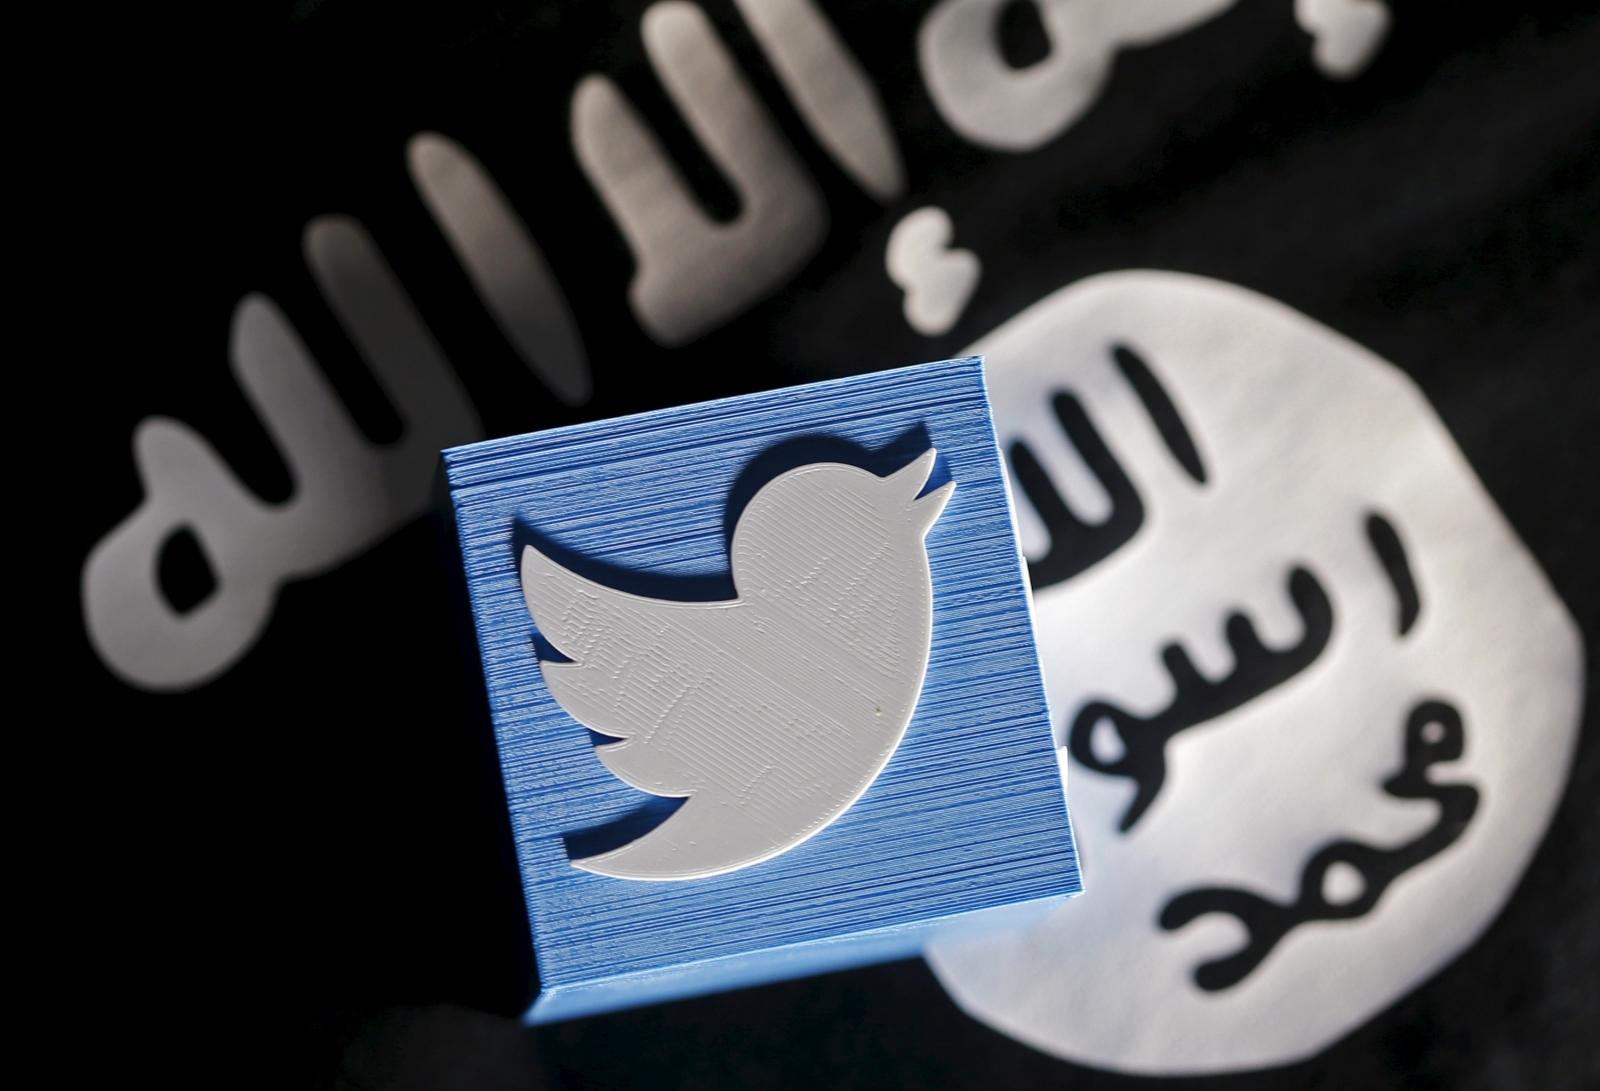 Twitter terror-linked accounts